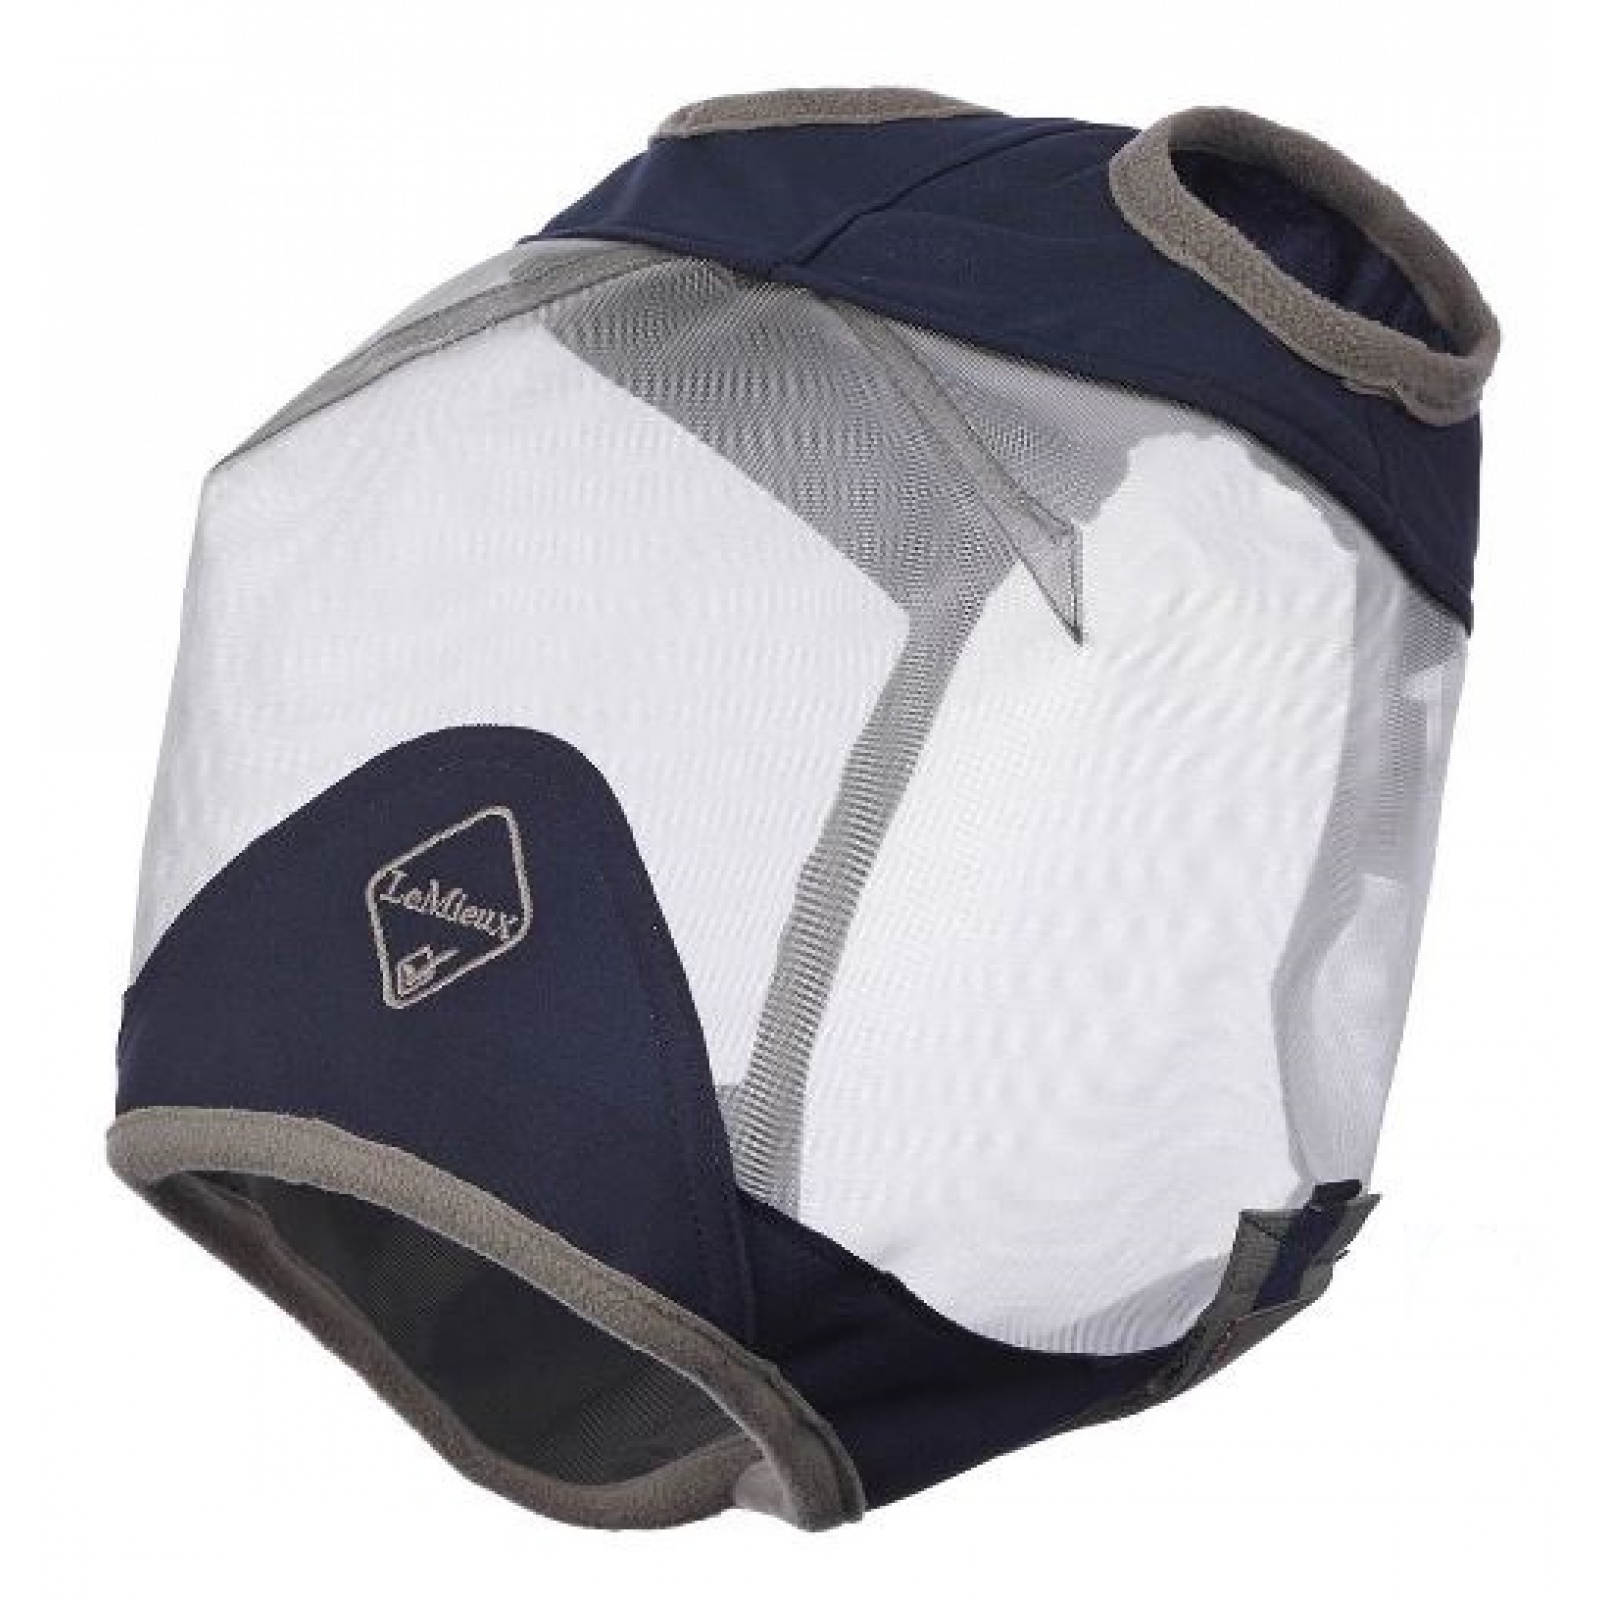 LeMieux-Armour-Shield-Fly-Protector-Mask thumbnail 14